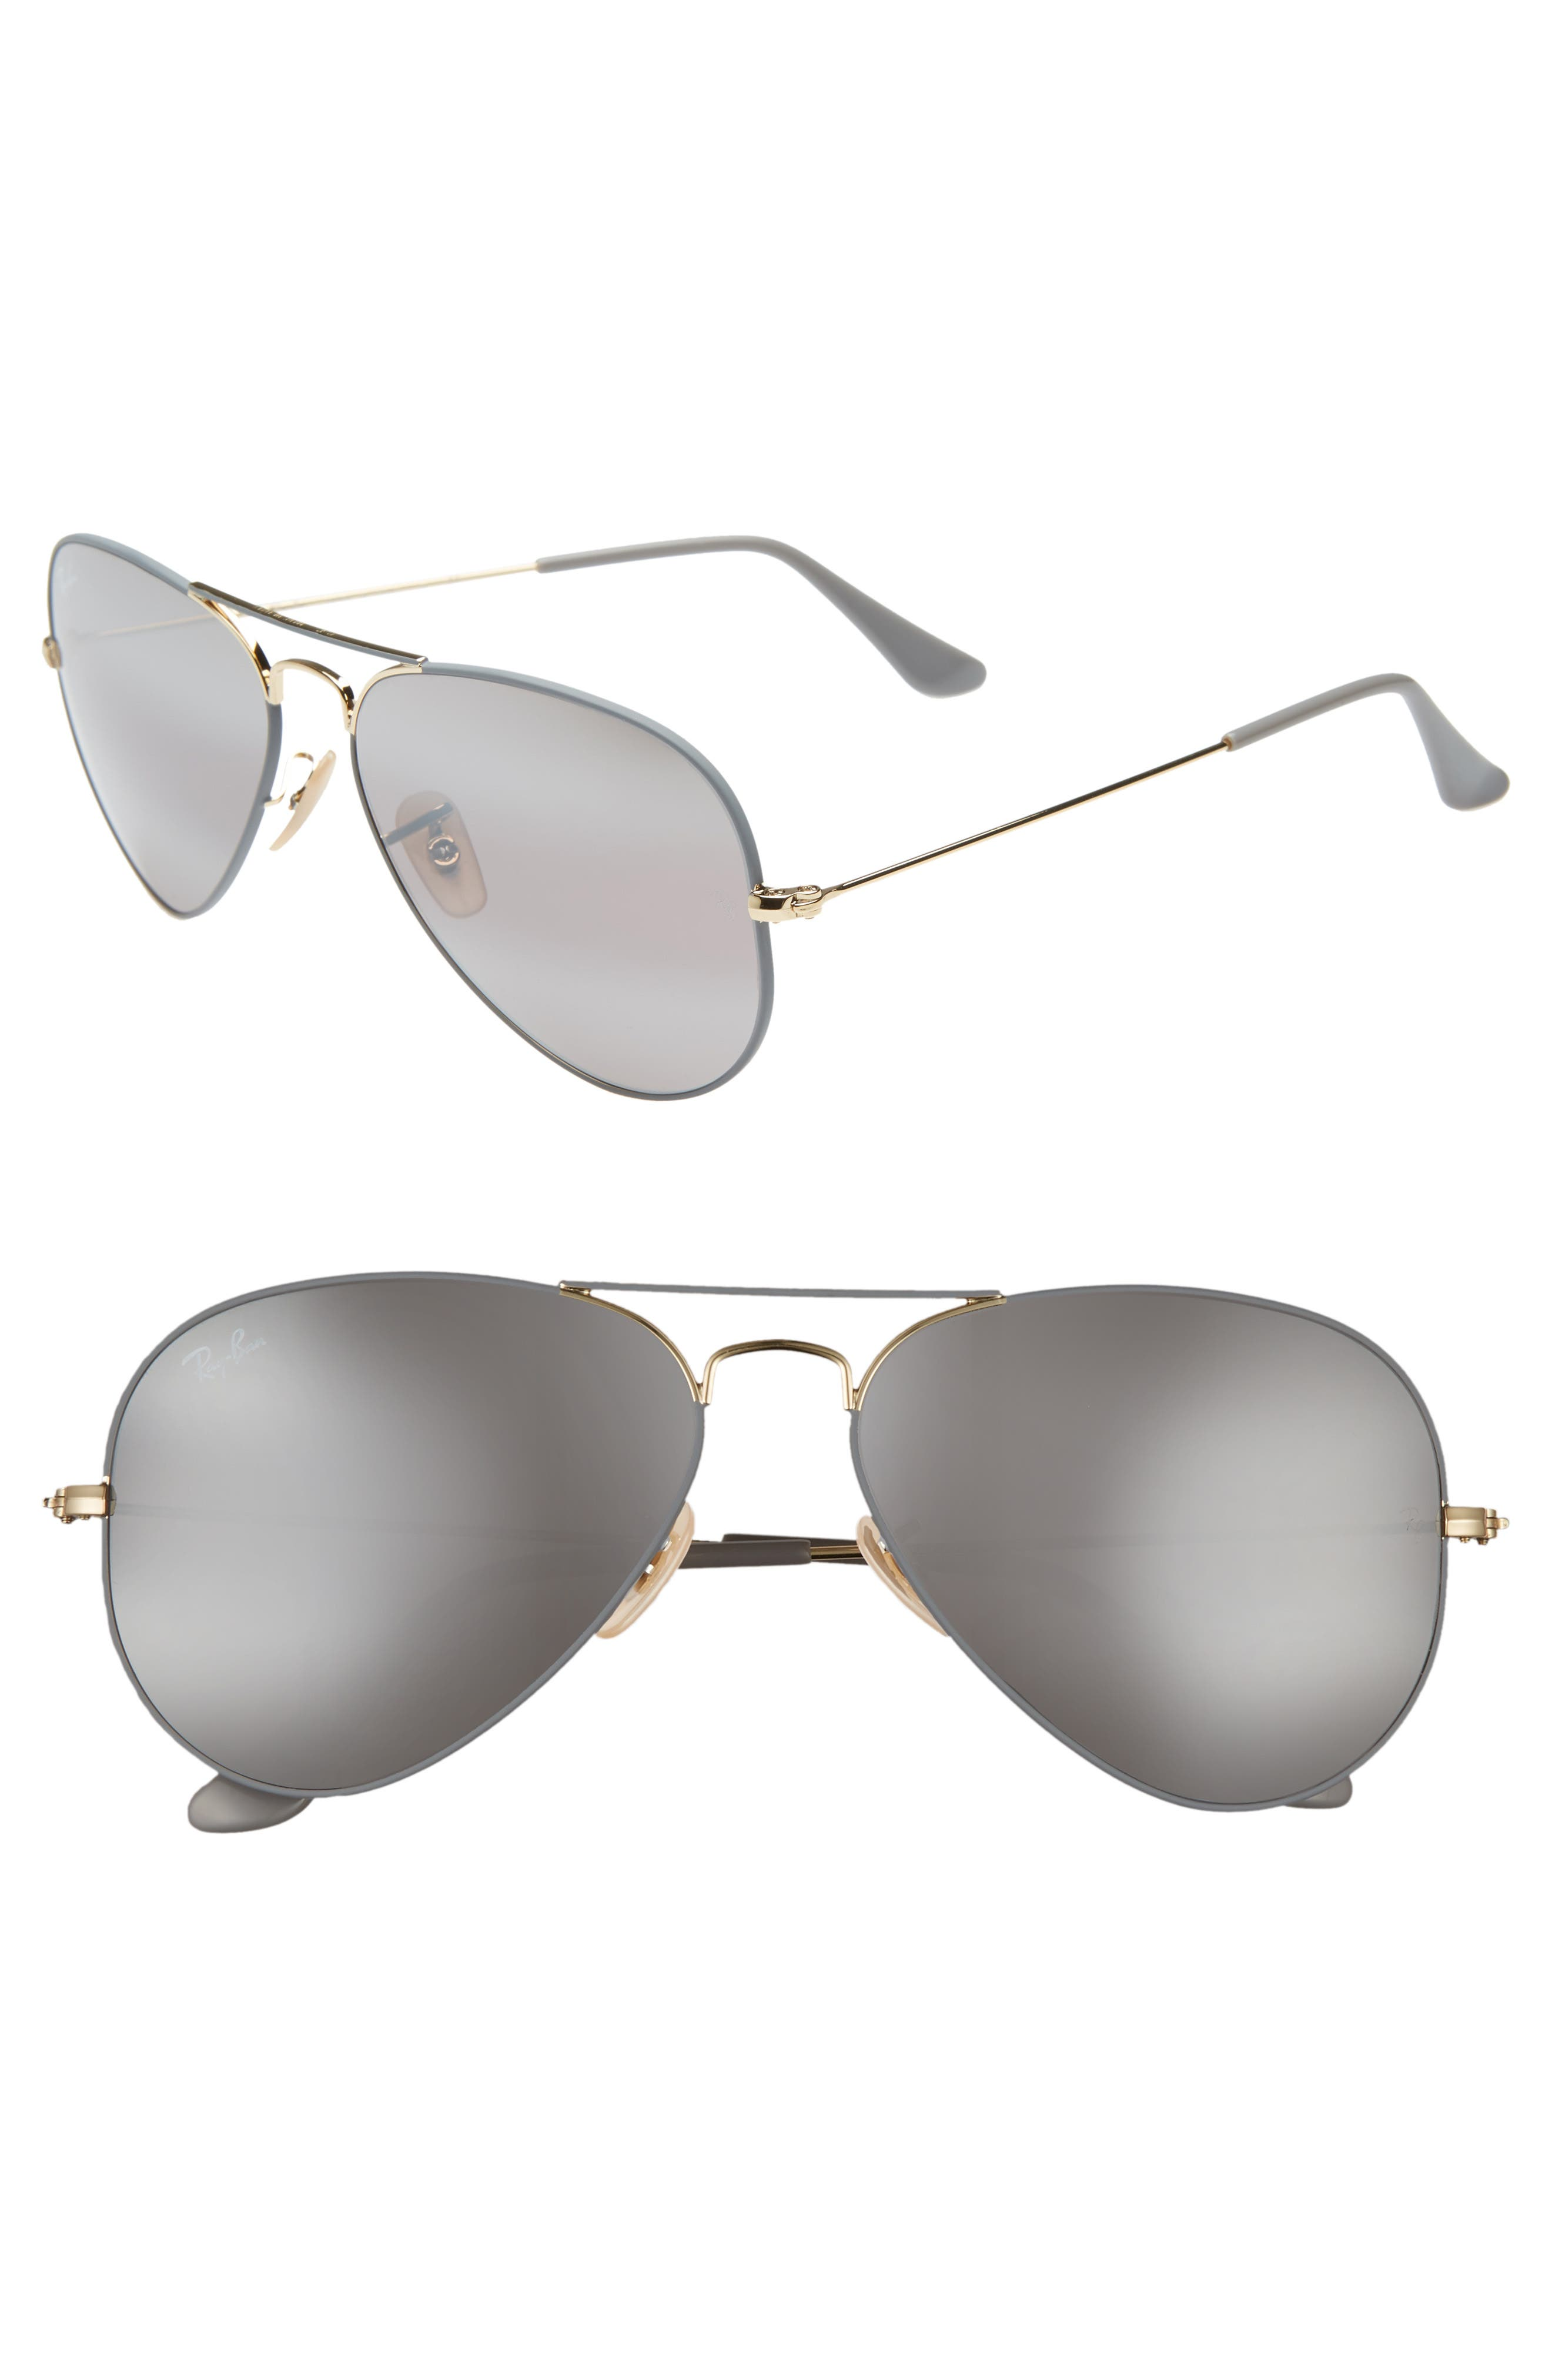 abf54298cc Men s Yellow Sunglasses   Eyeglasses